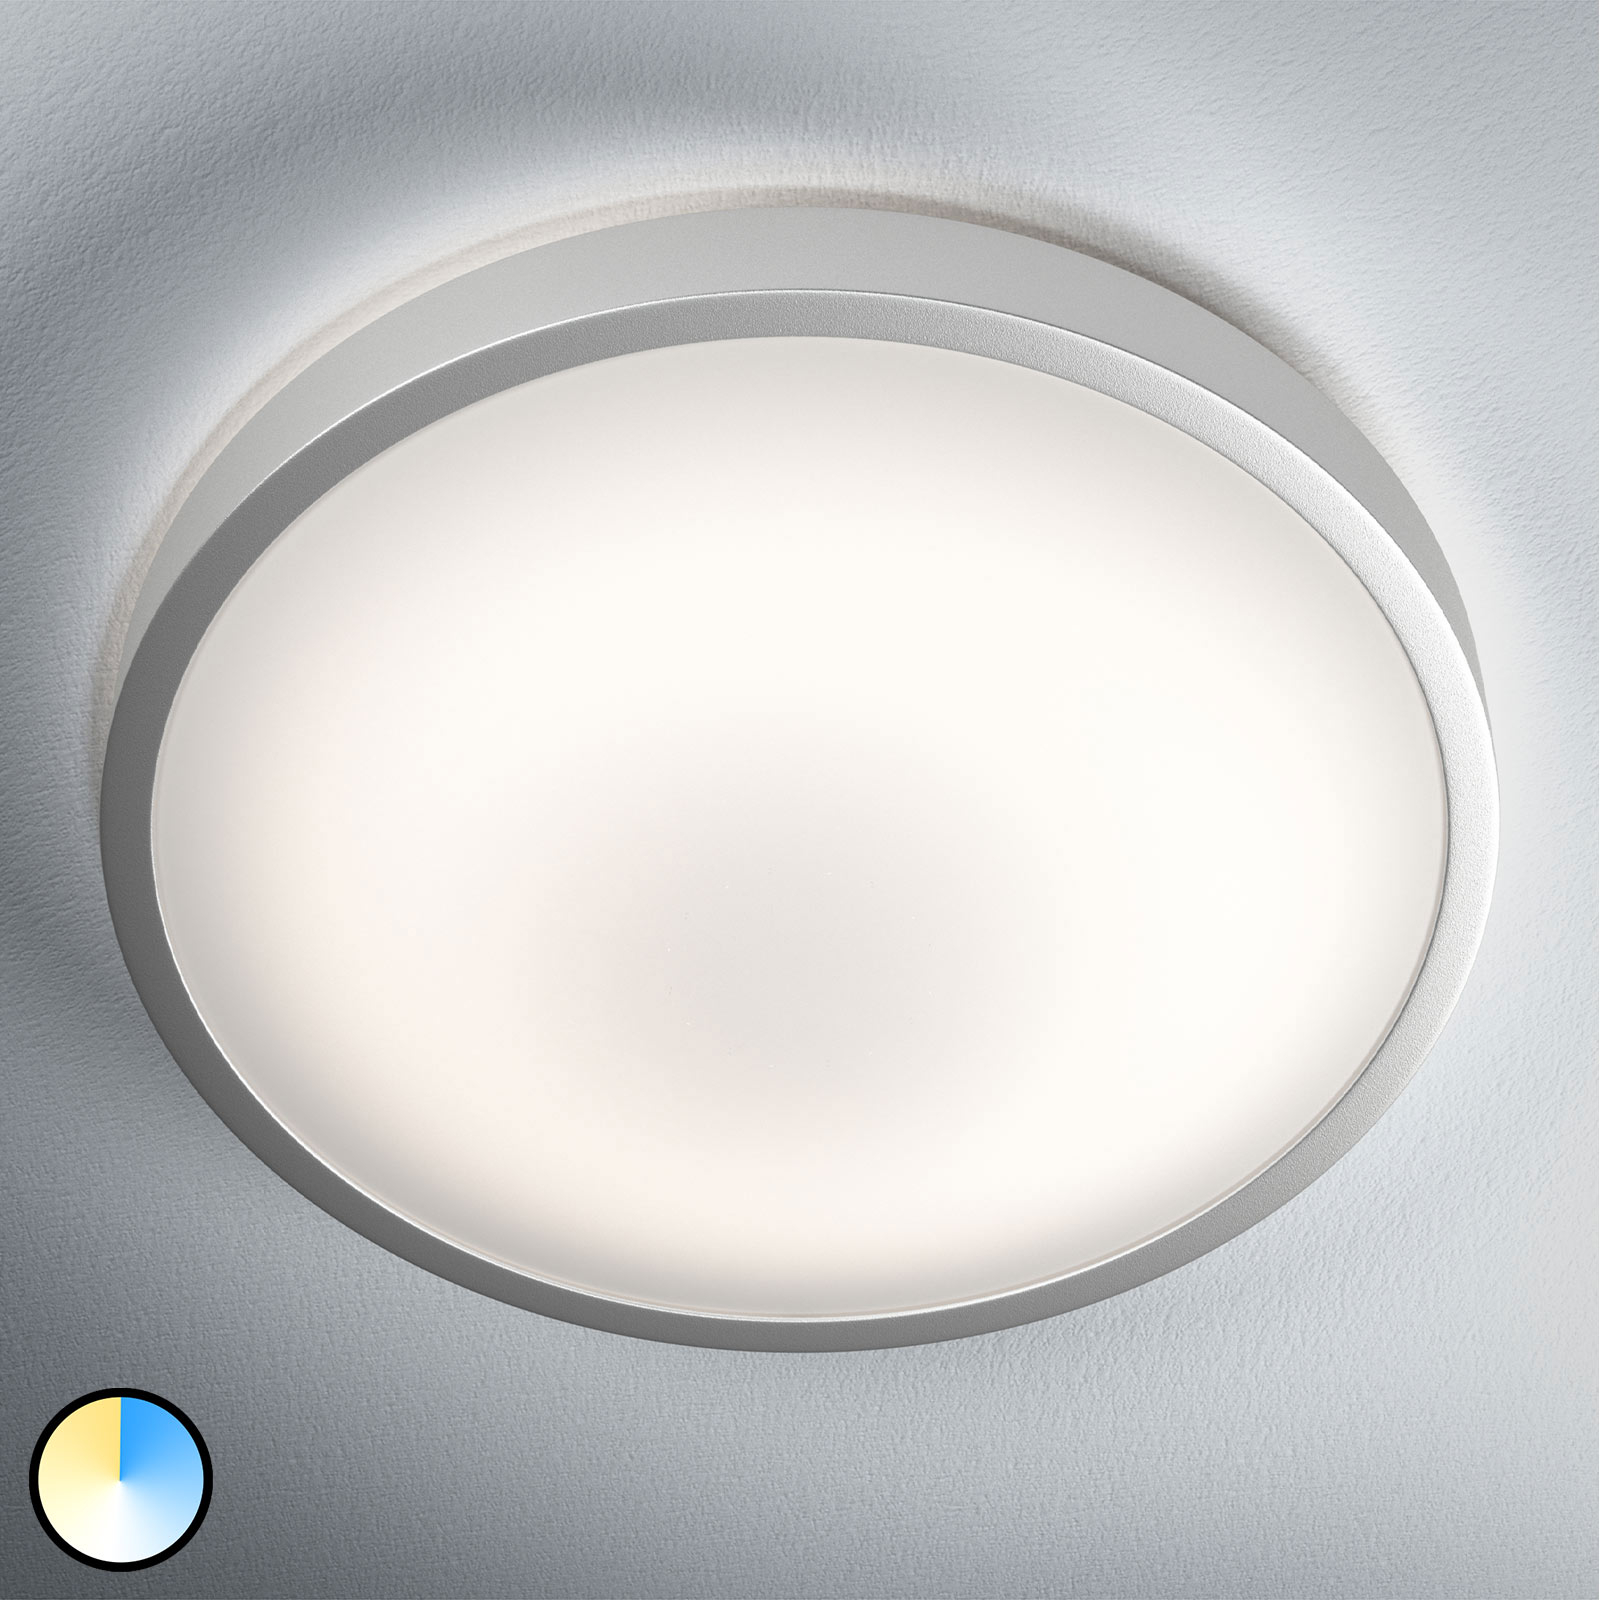 Acquista LEDVANCE Orbis plafoniera LED 30 cm Remote-CCT